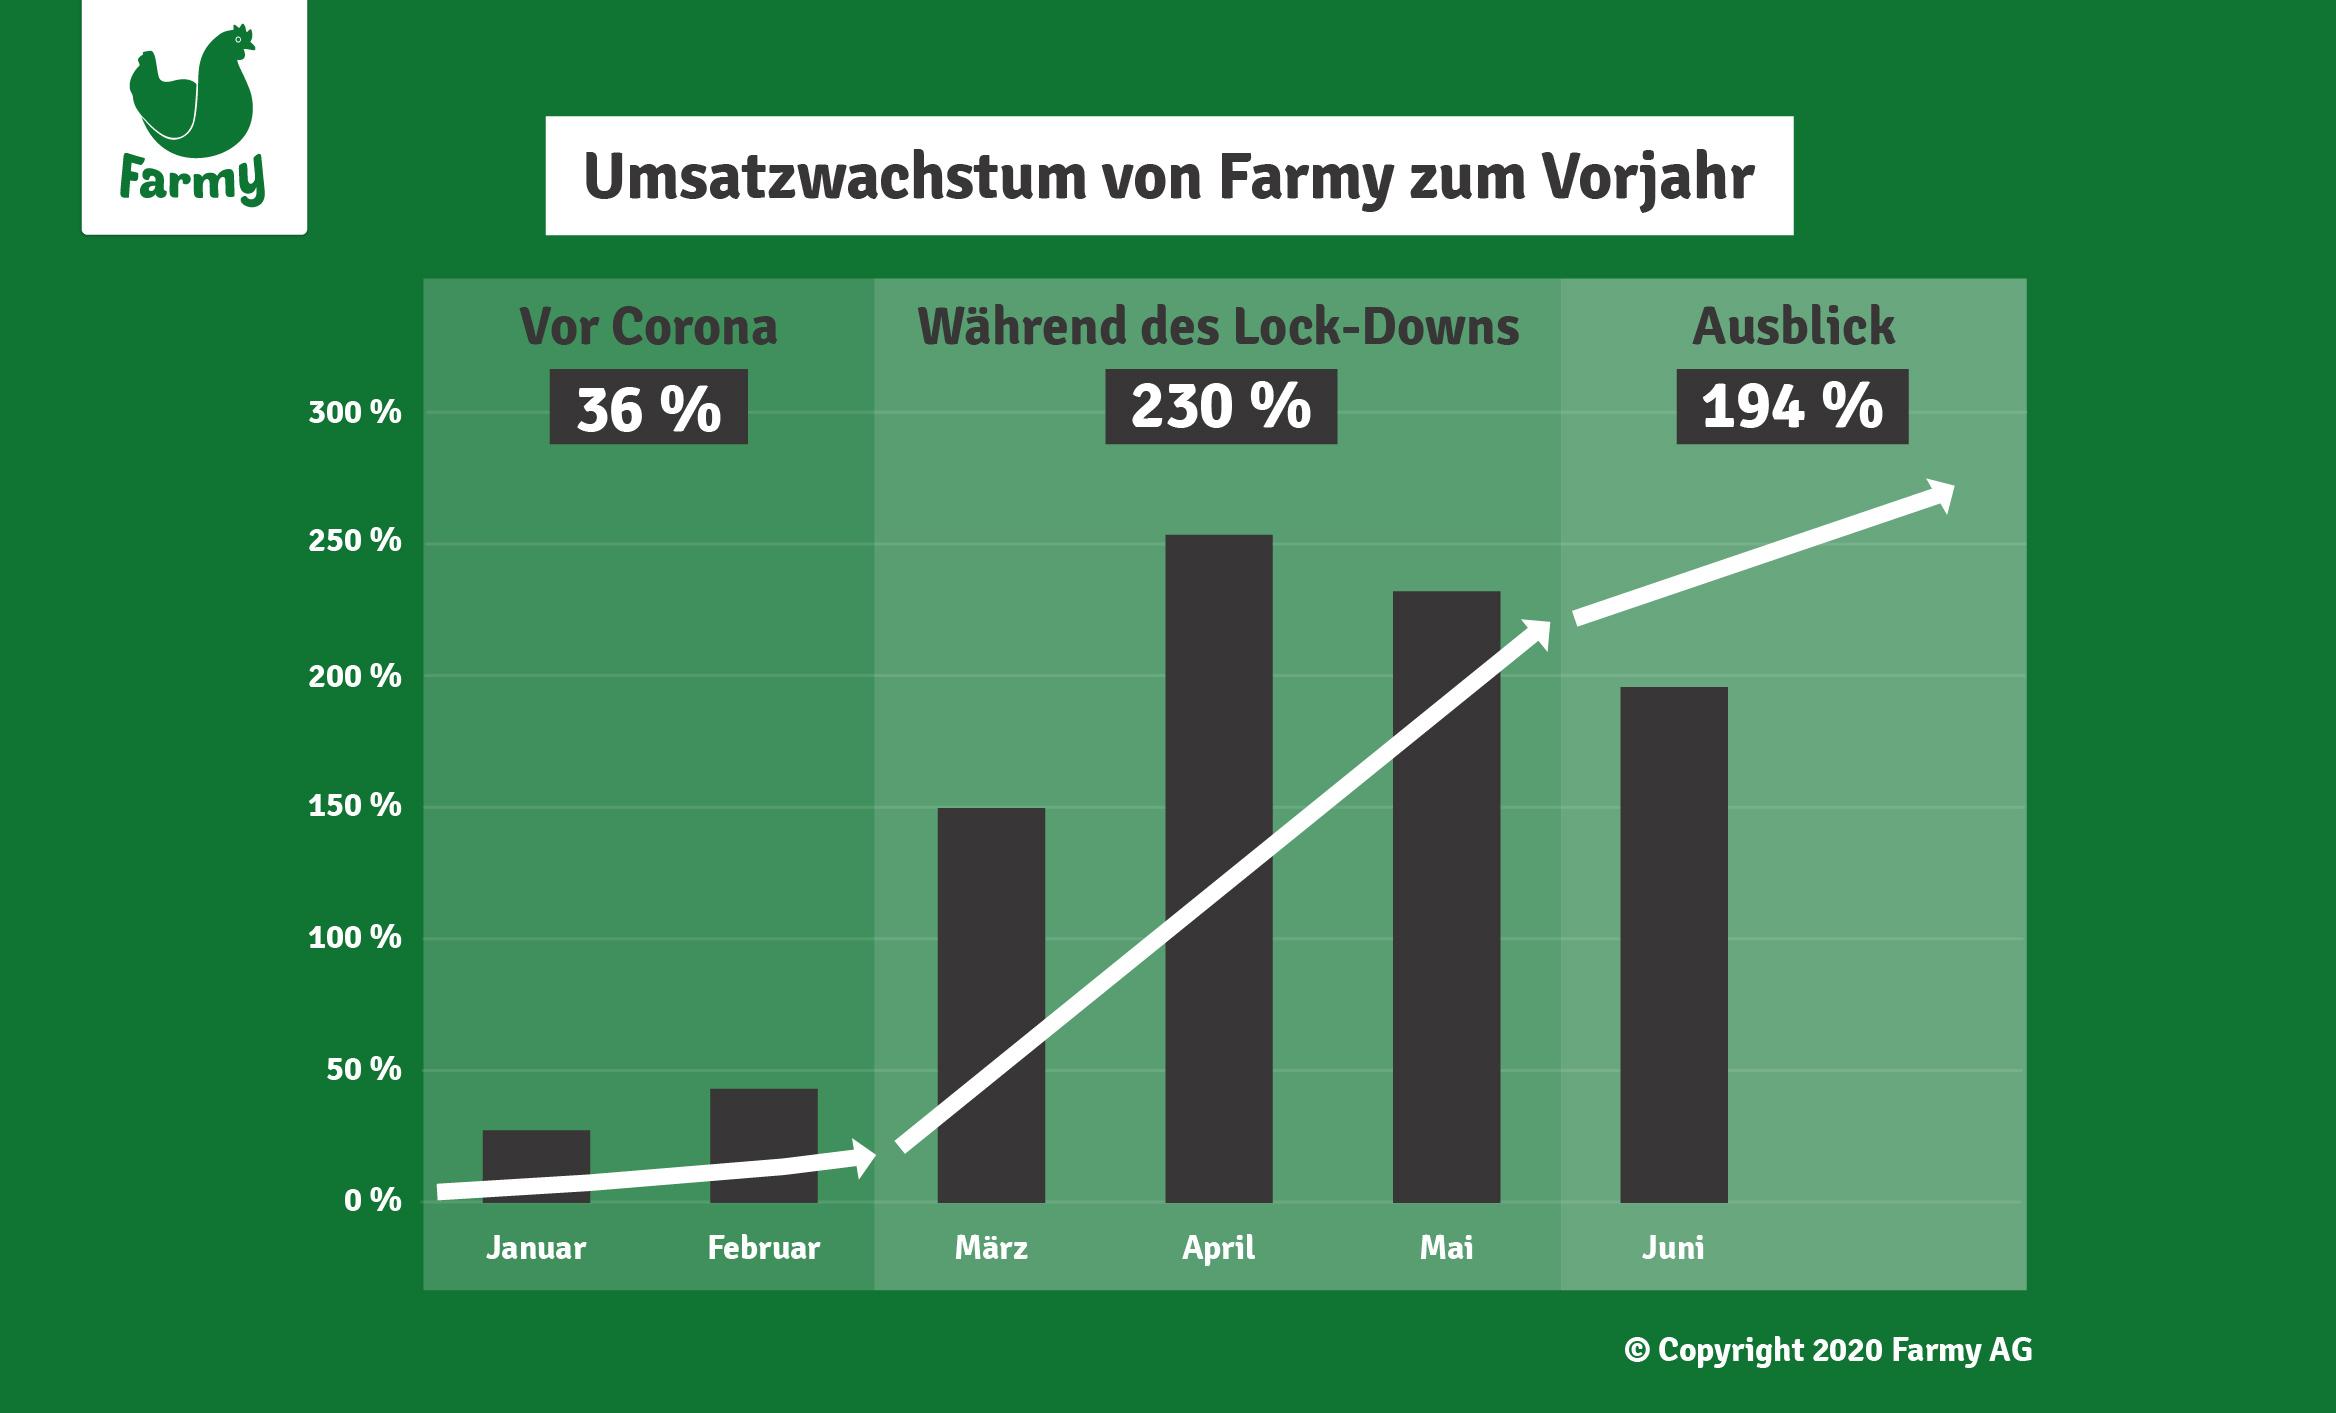 Umsatzwachstum Farmy.ch während des Corona-Shutdowns / Quelle: Farmy.ch